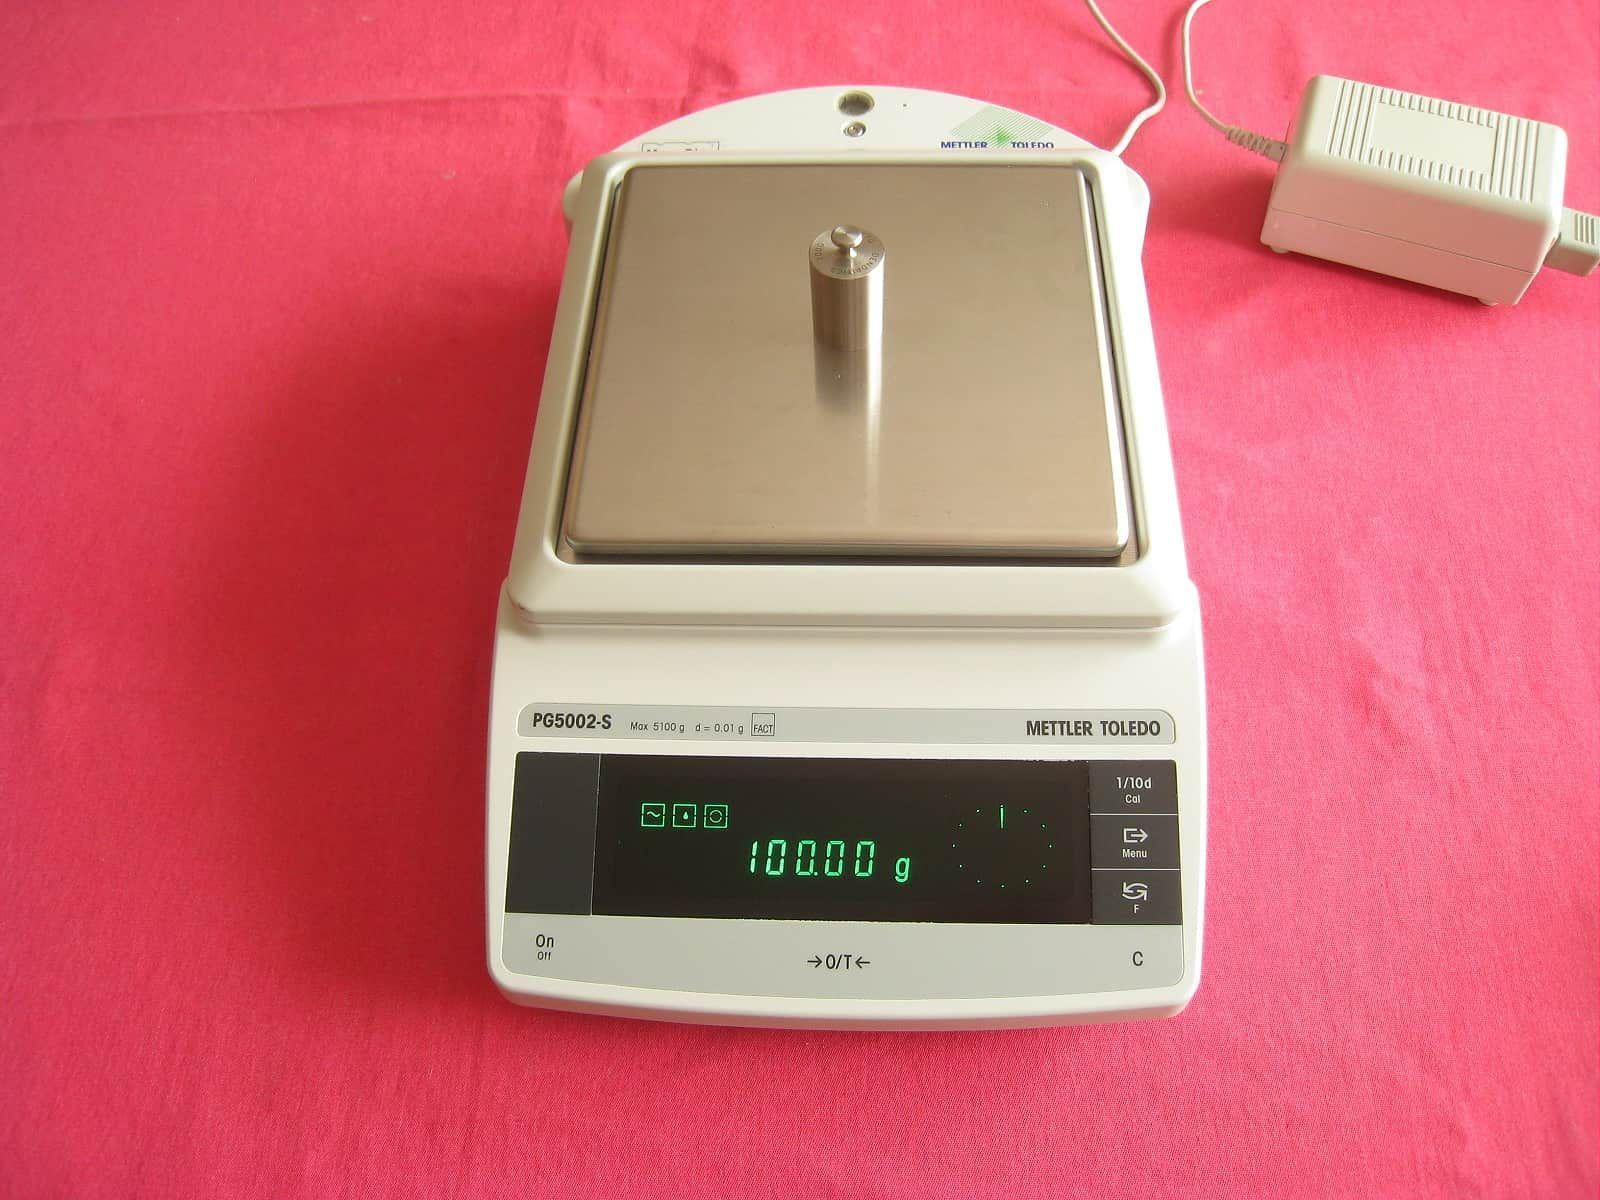 Mettler Toledo PG5002-S Balance Scale 5100.00g